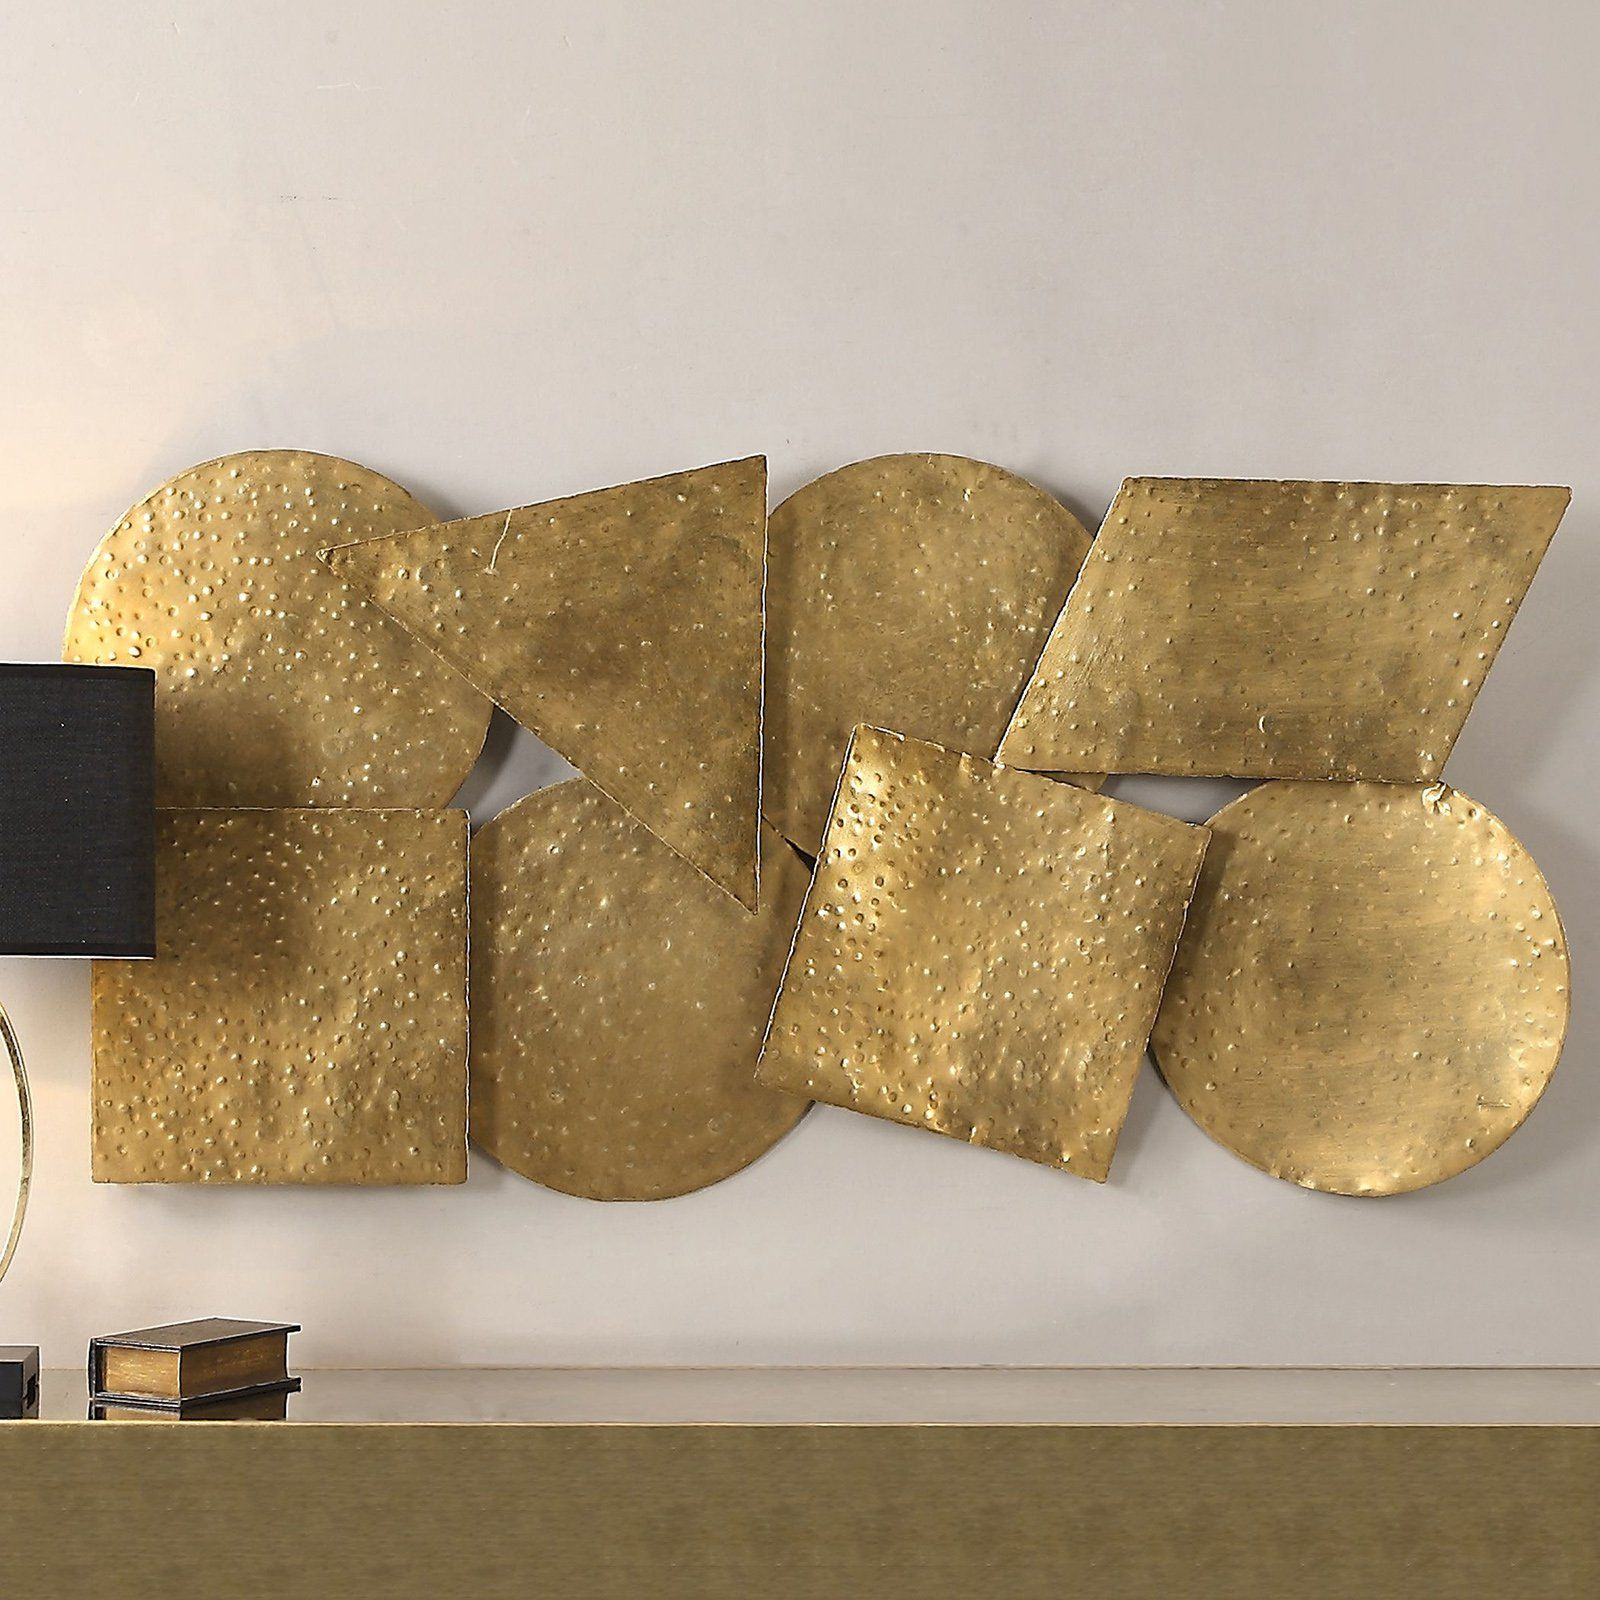 Uttermost arrigo gold wall art w x h in from hayneedle